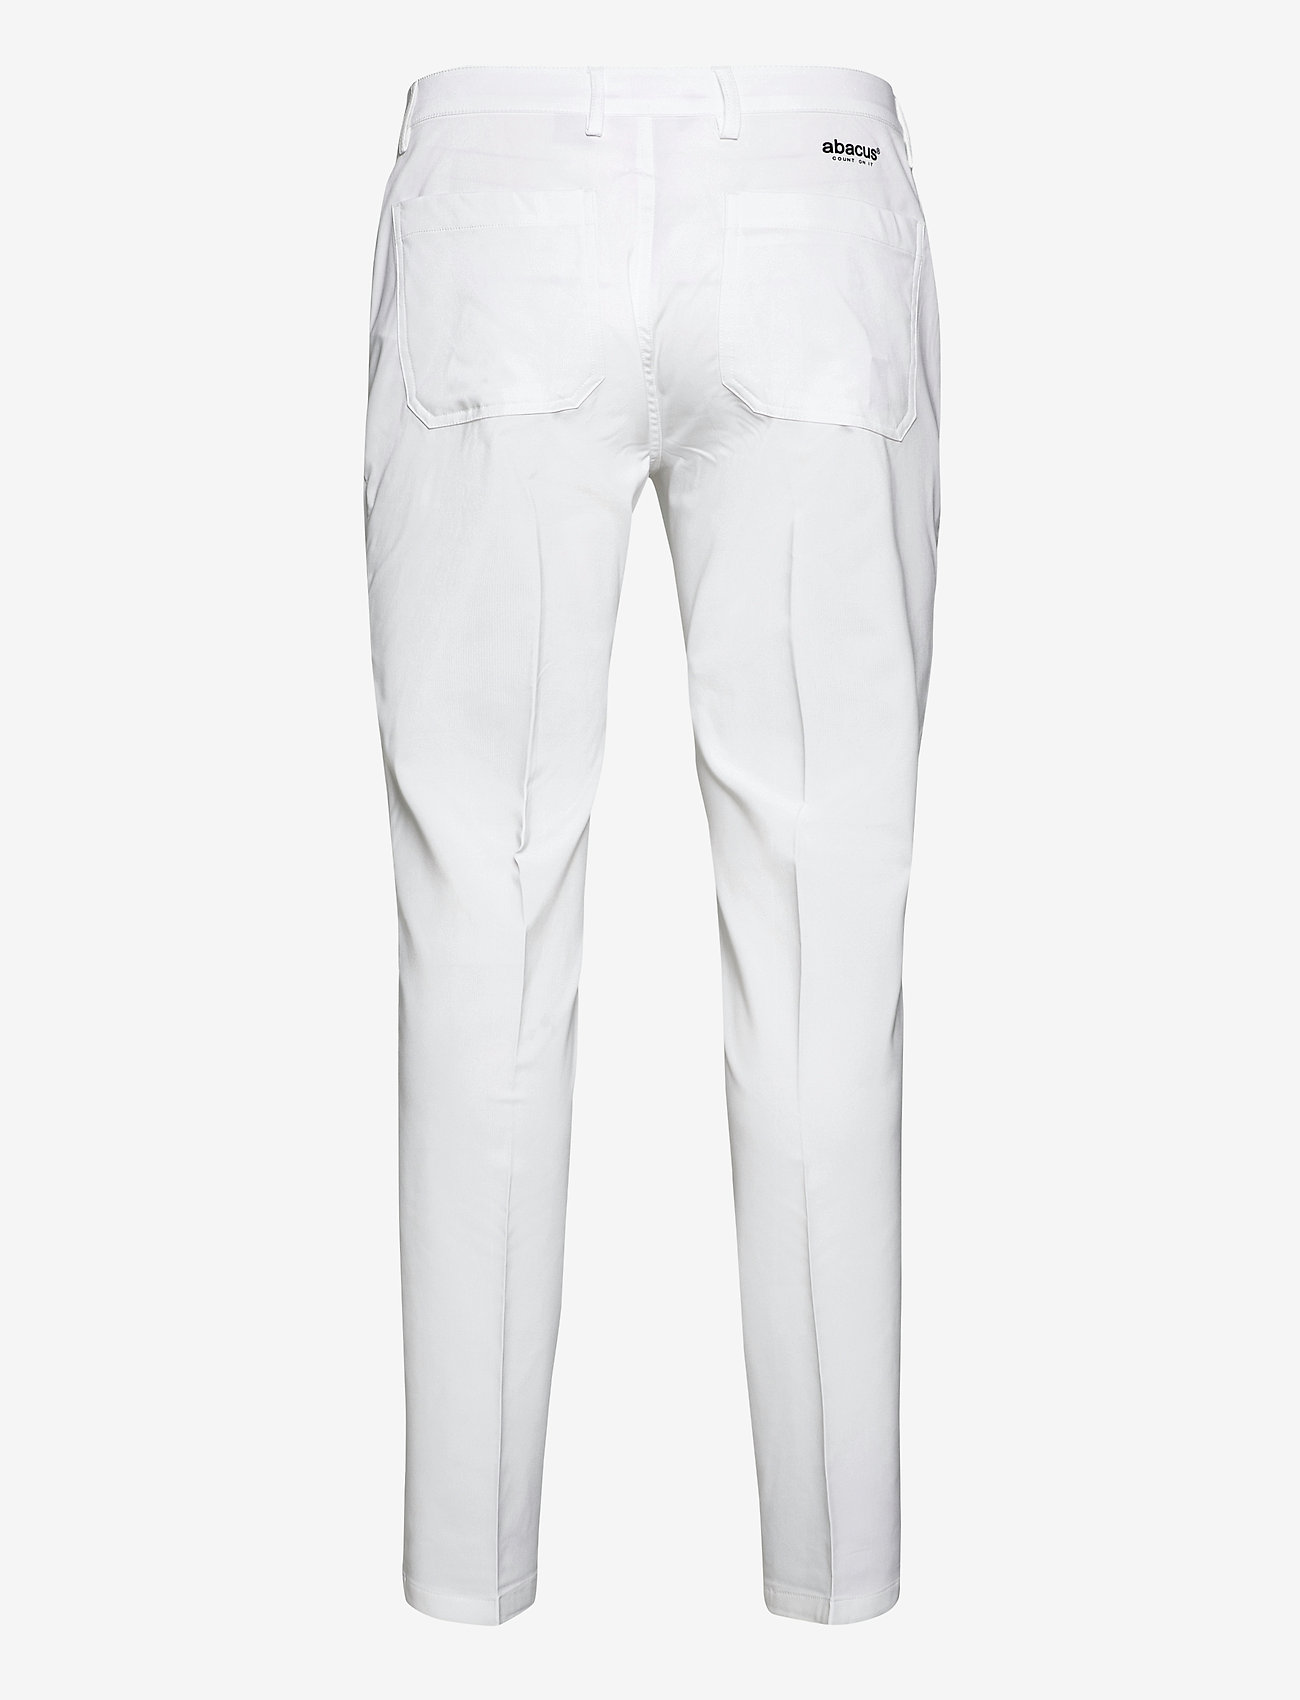 Abacus - Mens Cleek stretch trousers - golf-housut - white - 1